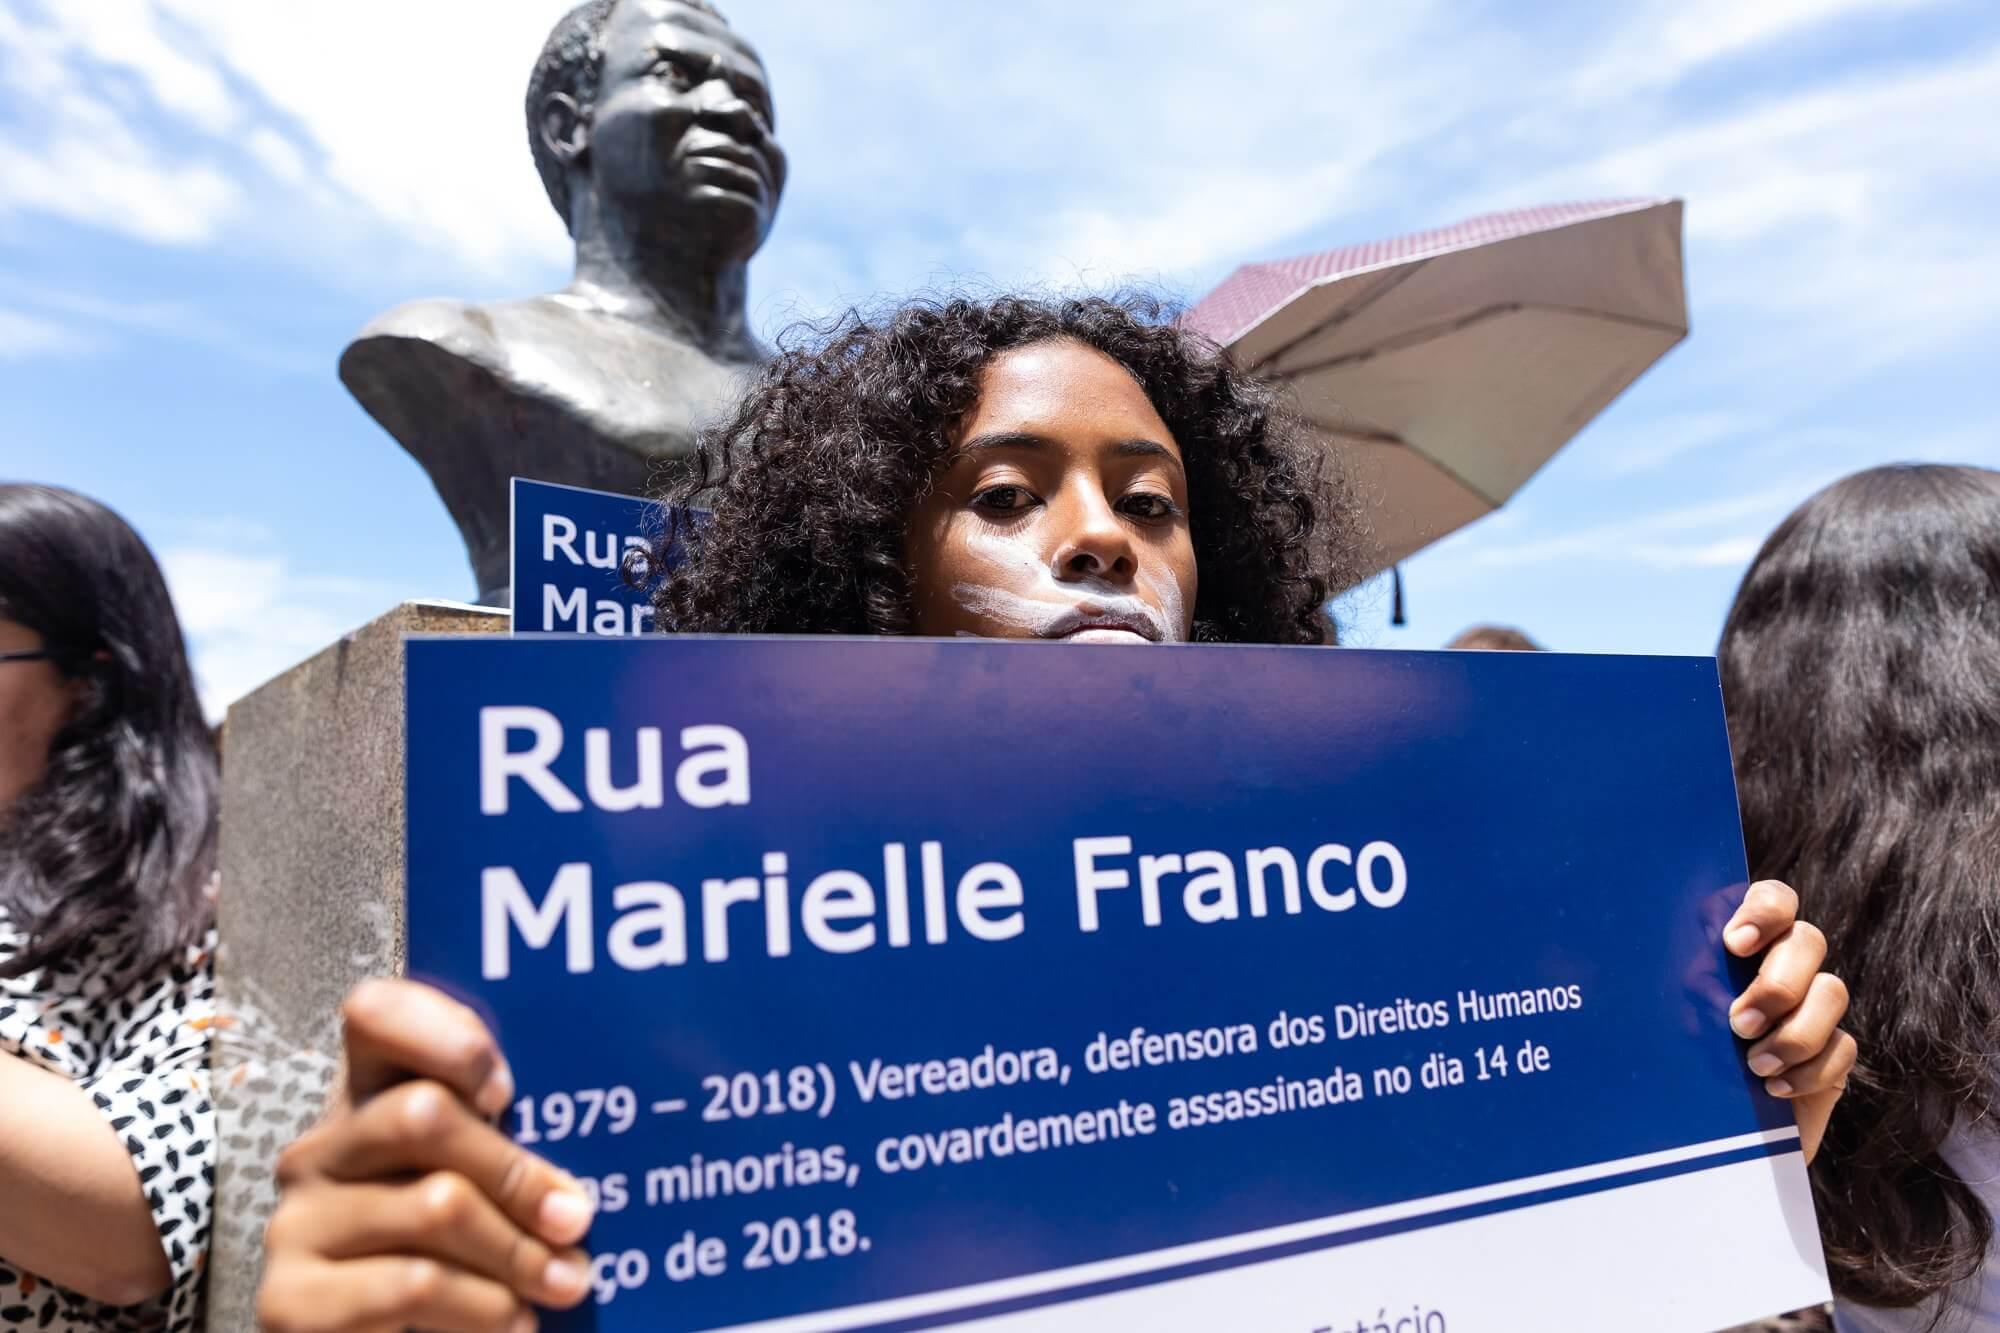 2 anos sem respostas: justiça para Marielle já!